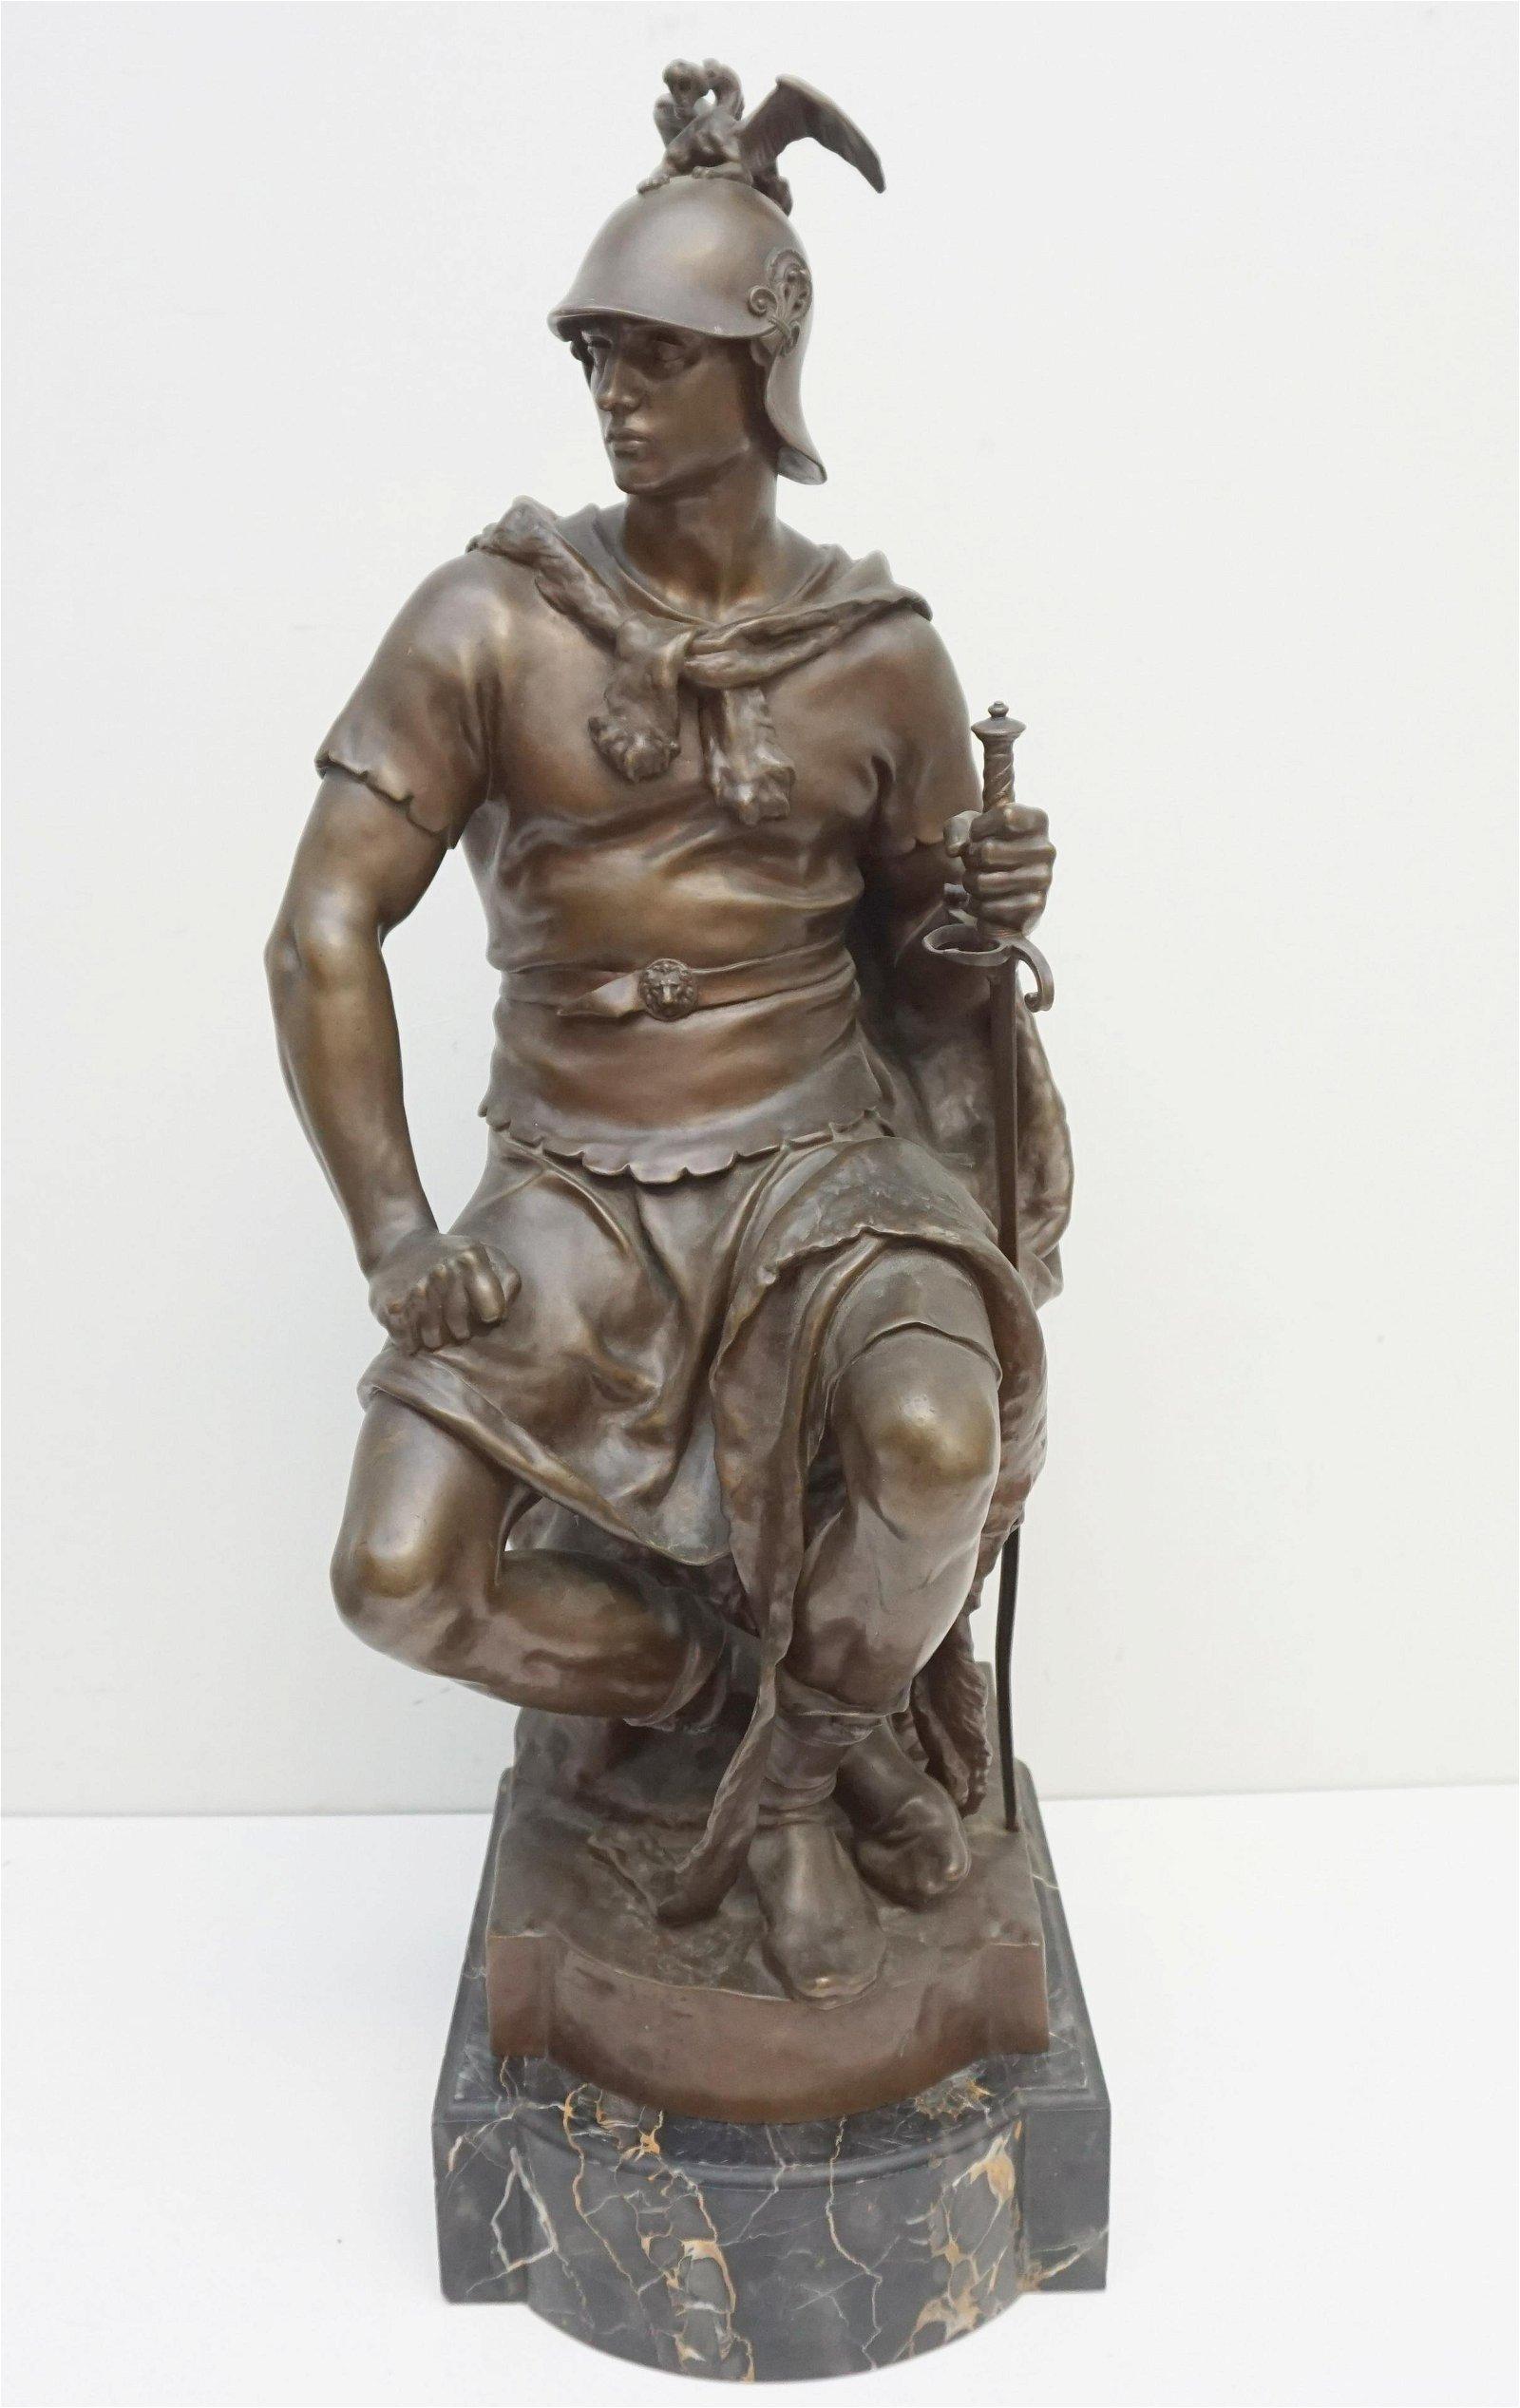 LARGE PAUL DUBOIS (1829-1905) BARBEDIENNE BRONZE